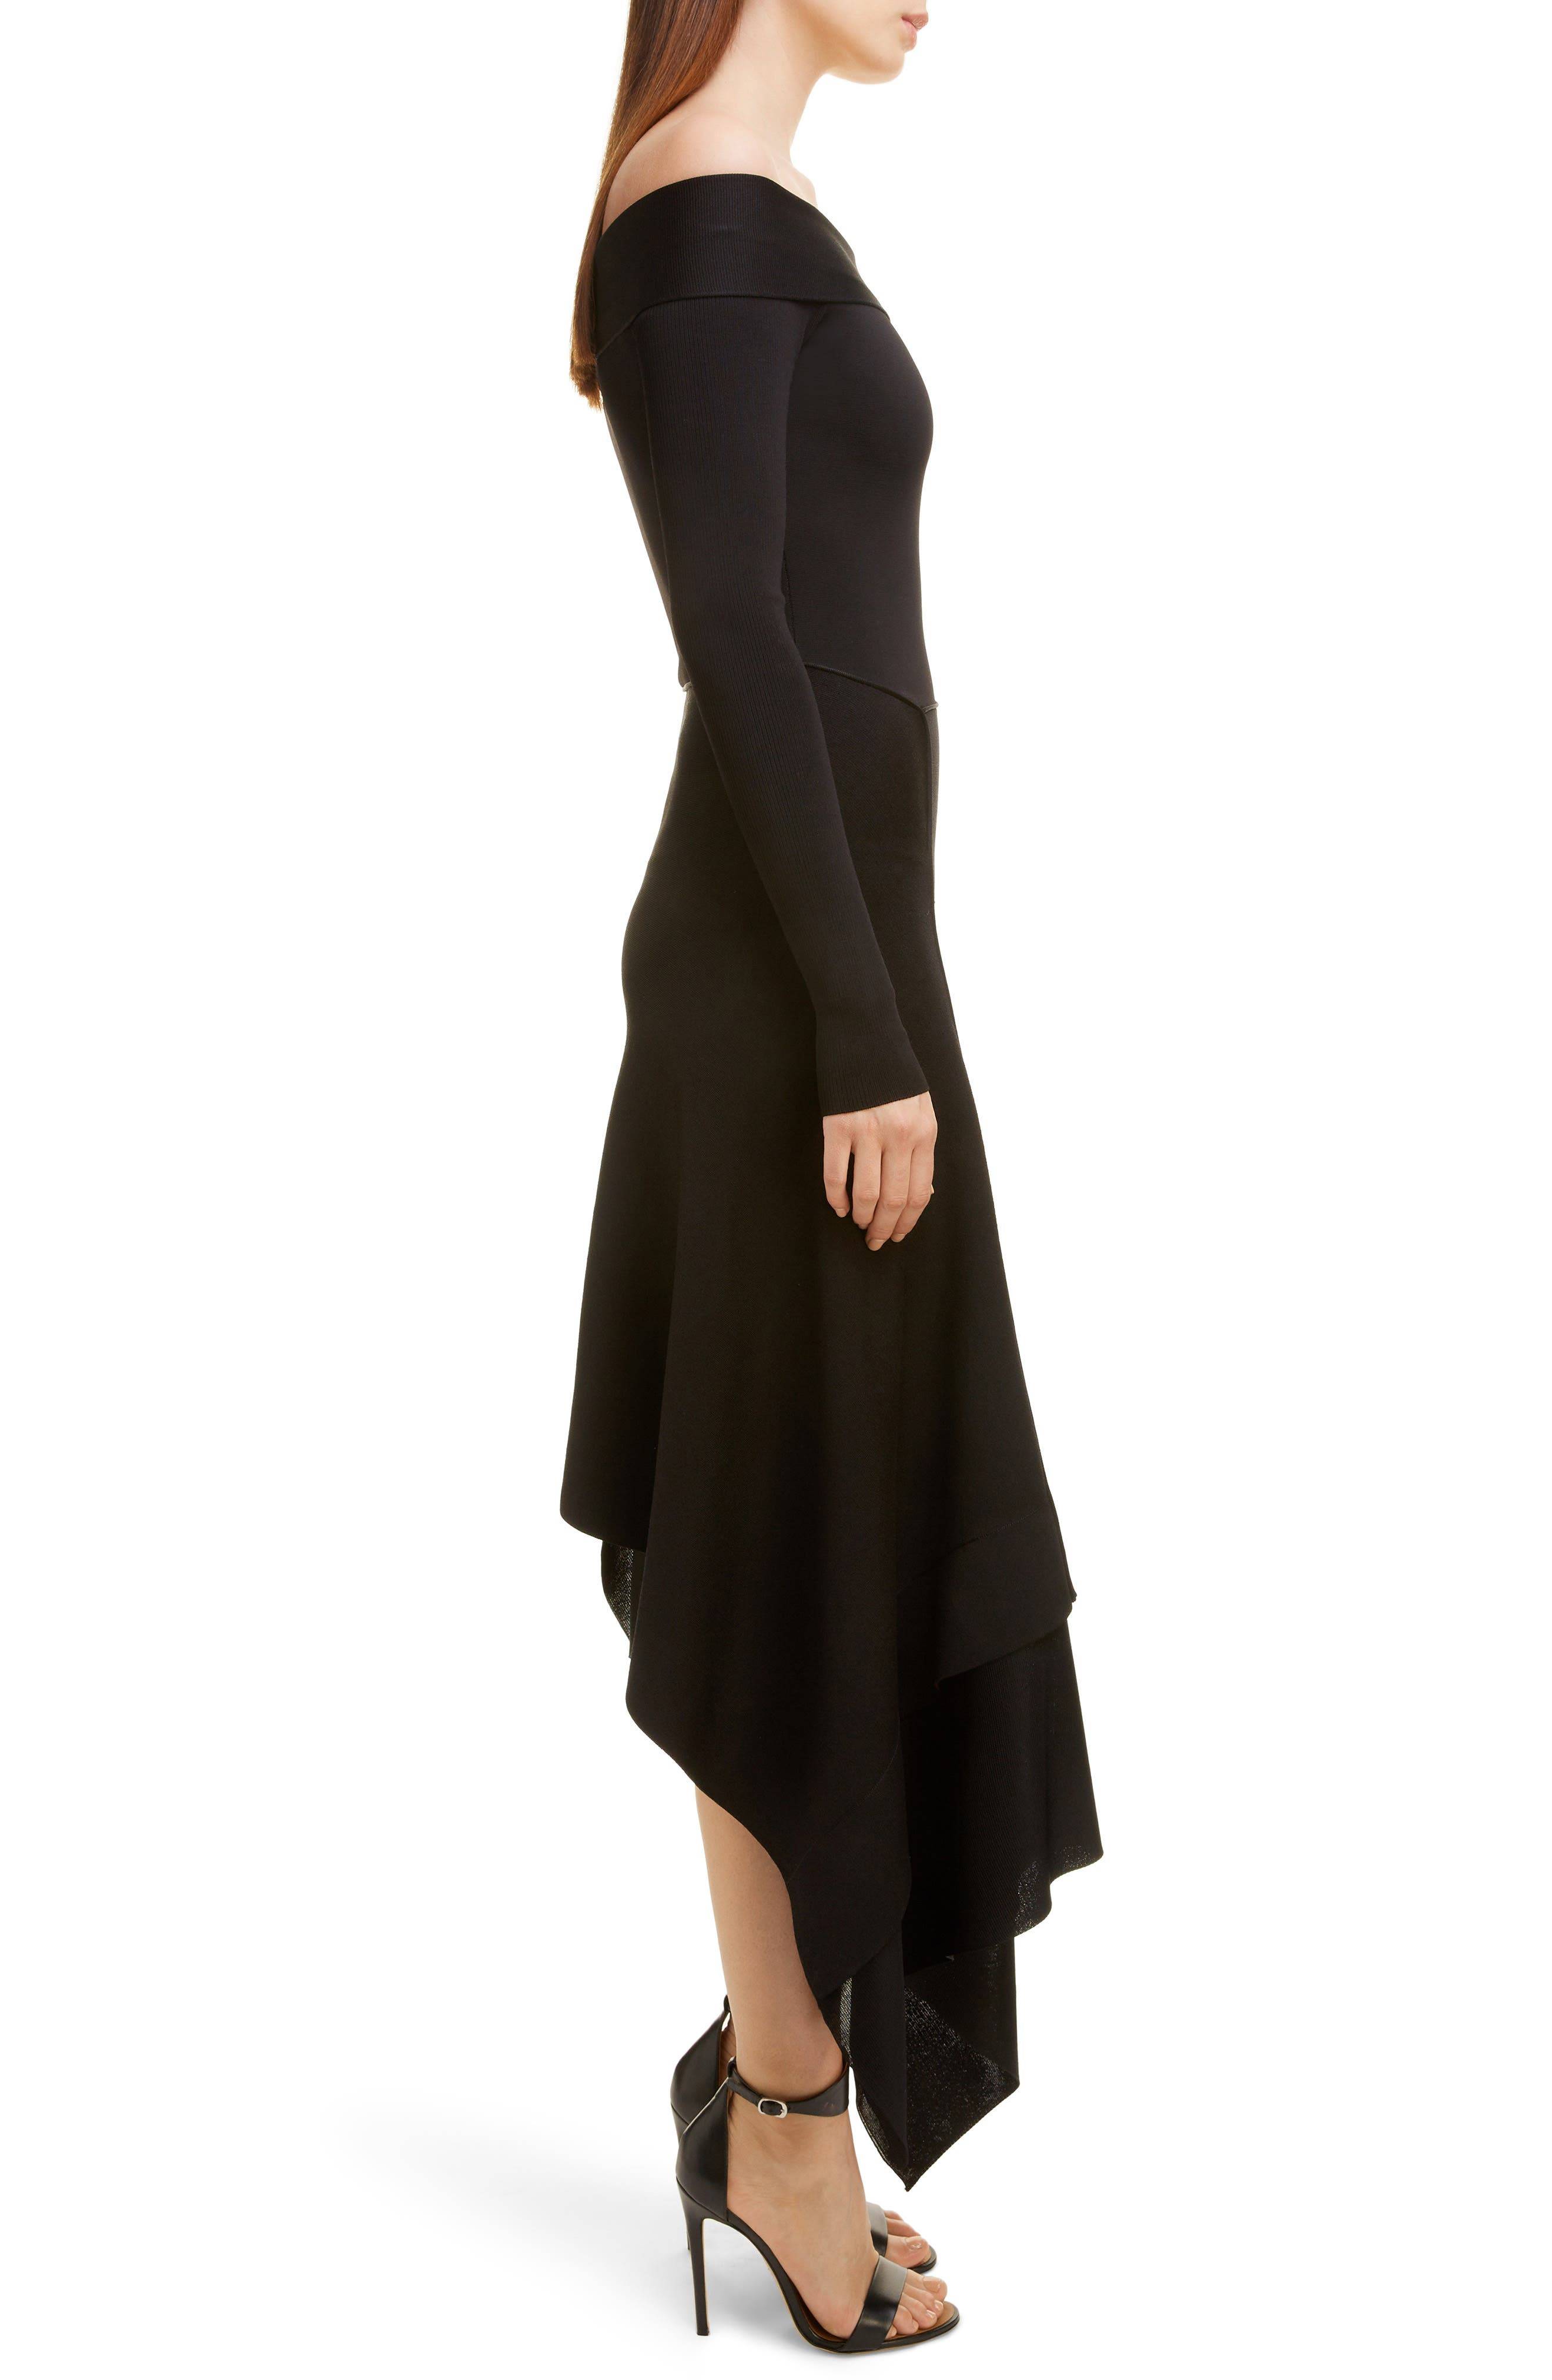 VICTORIA BECKHAM, Long Sleeve Off the Shoulder Asymmetrical Dress, Alternate thumbnail 3, color, BLACK